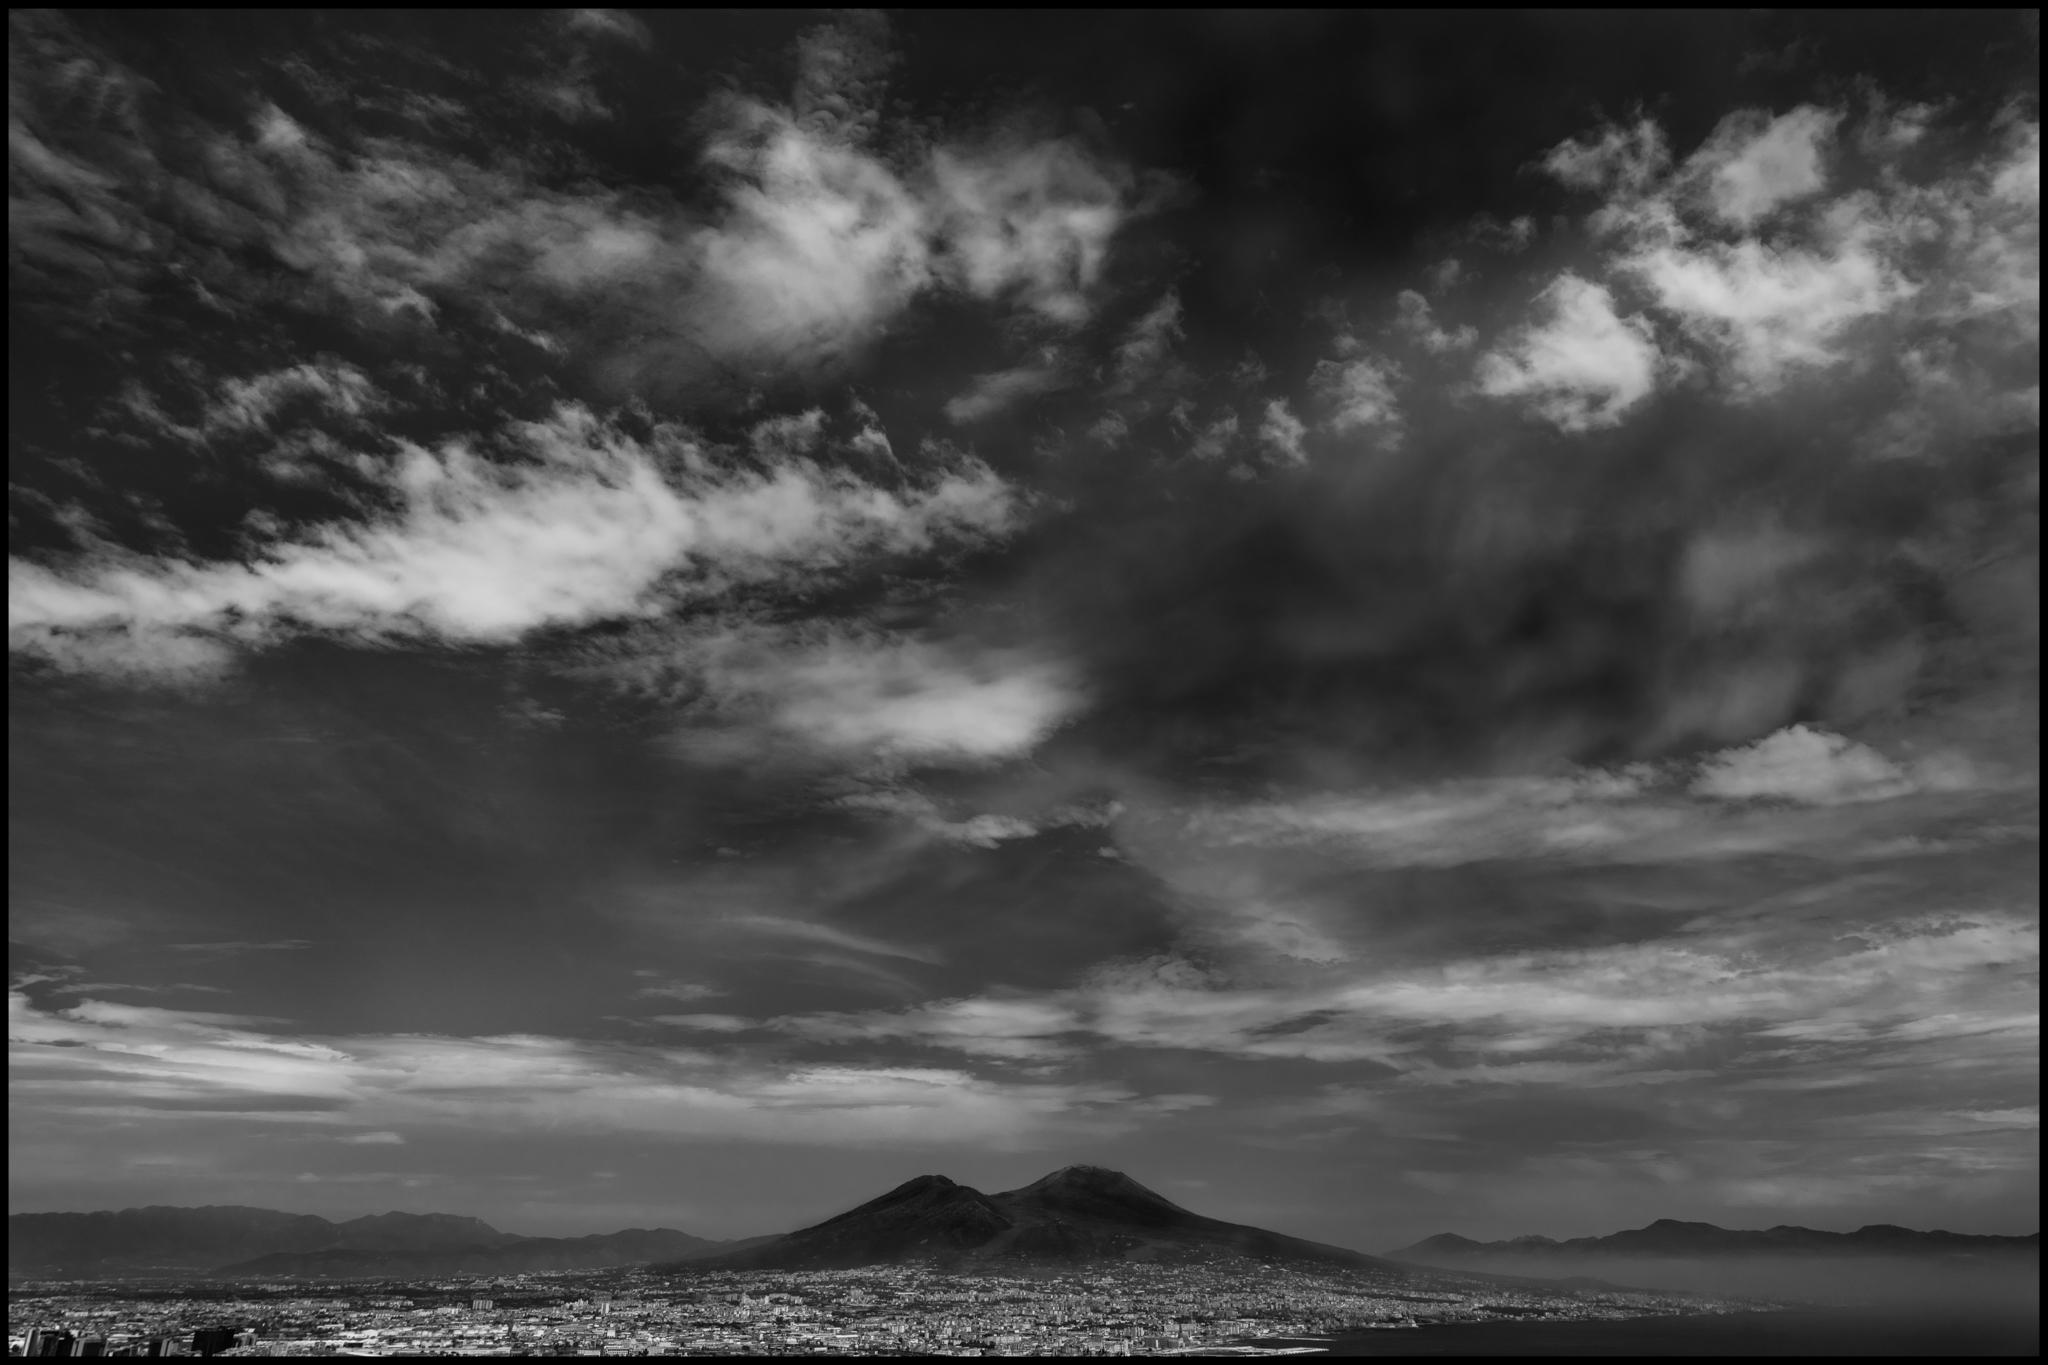 8 Jun 2019 - Mount Vesuvius, Naples IT